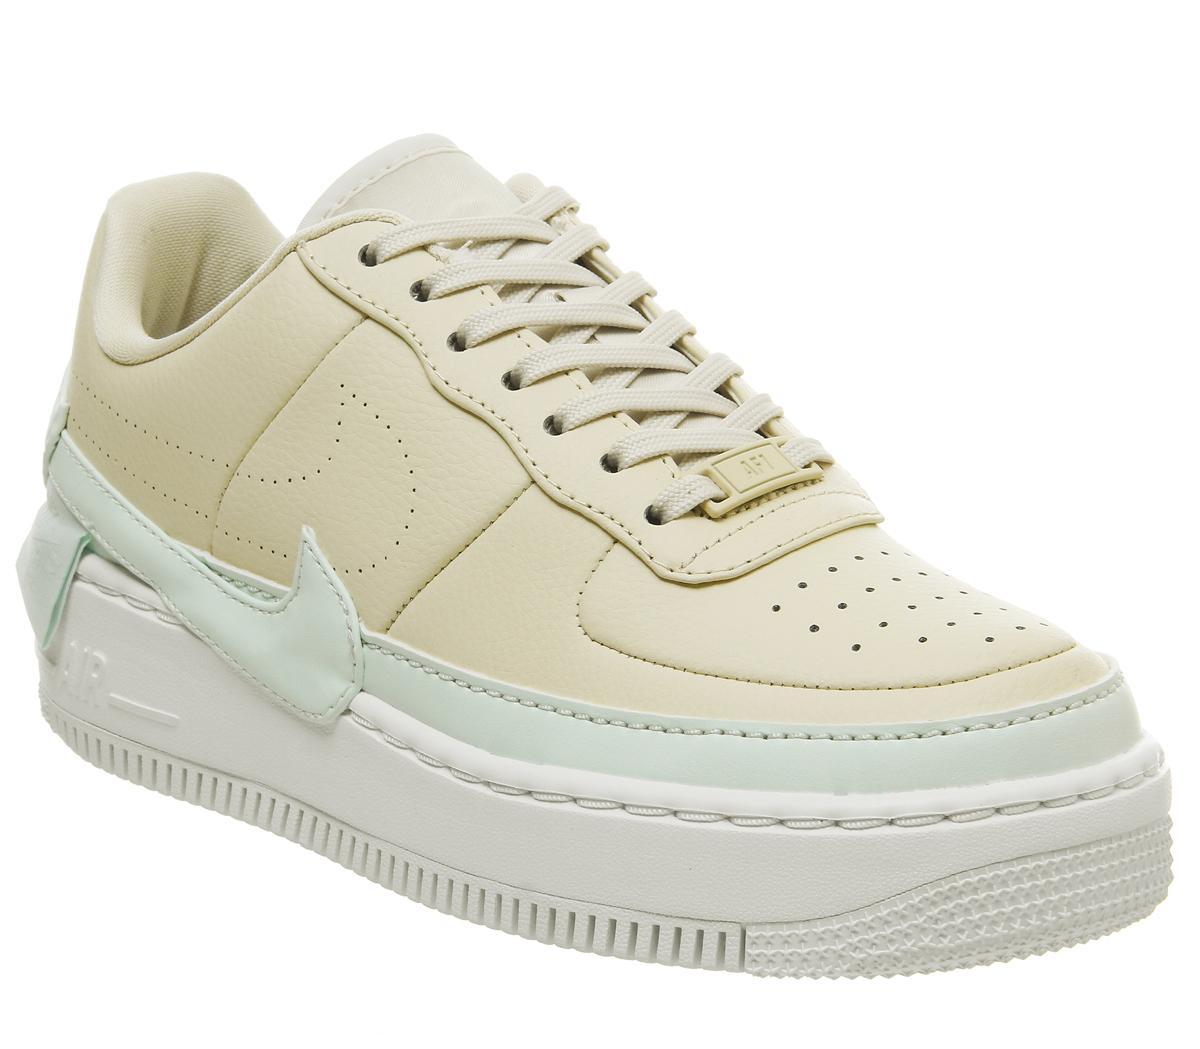 veterano Gracias limpiar  Nike Air Force 1 Jester Trainers Light Cream Ghost Aqua White - Hers  trainers